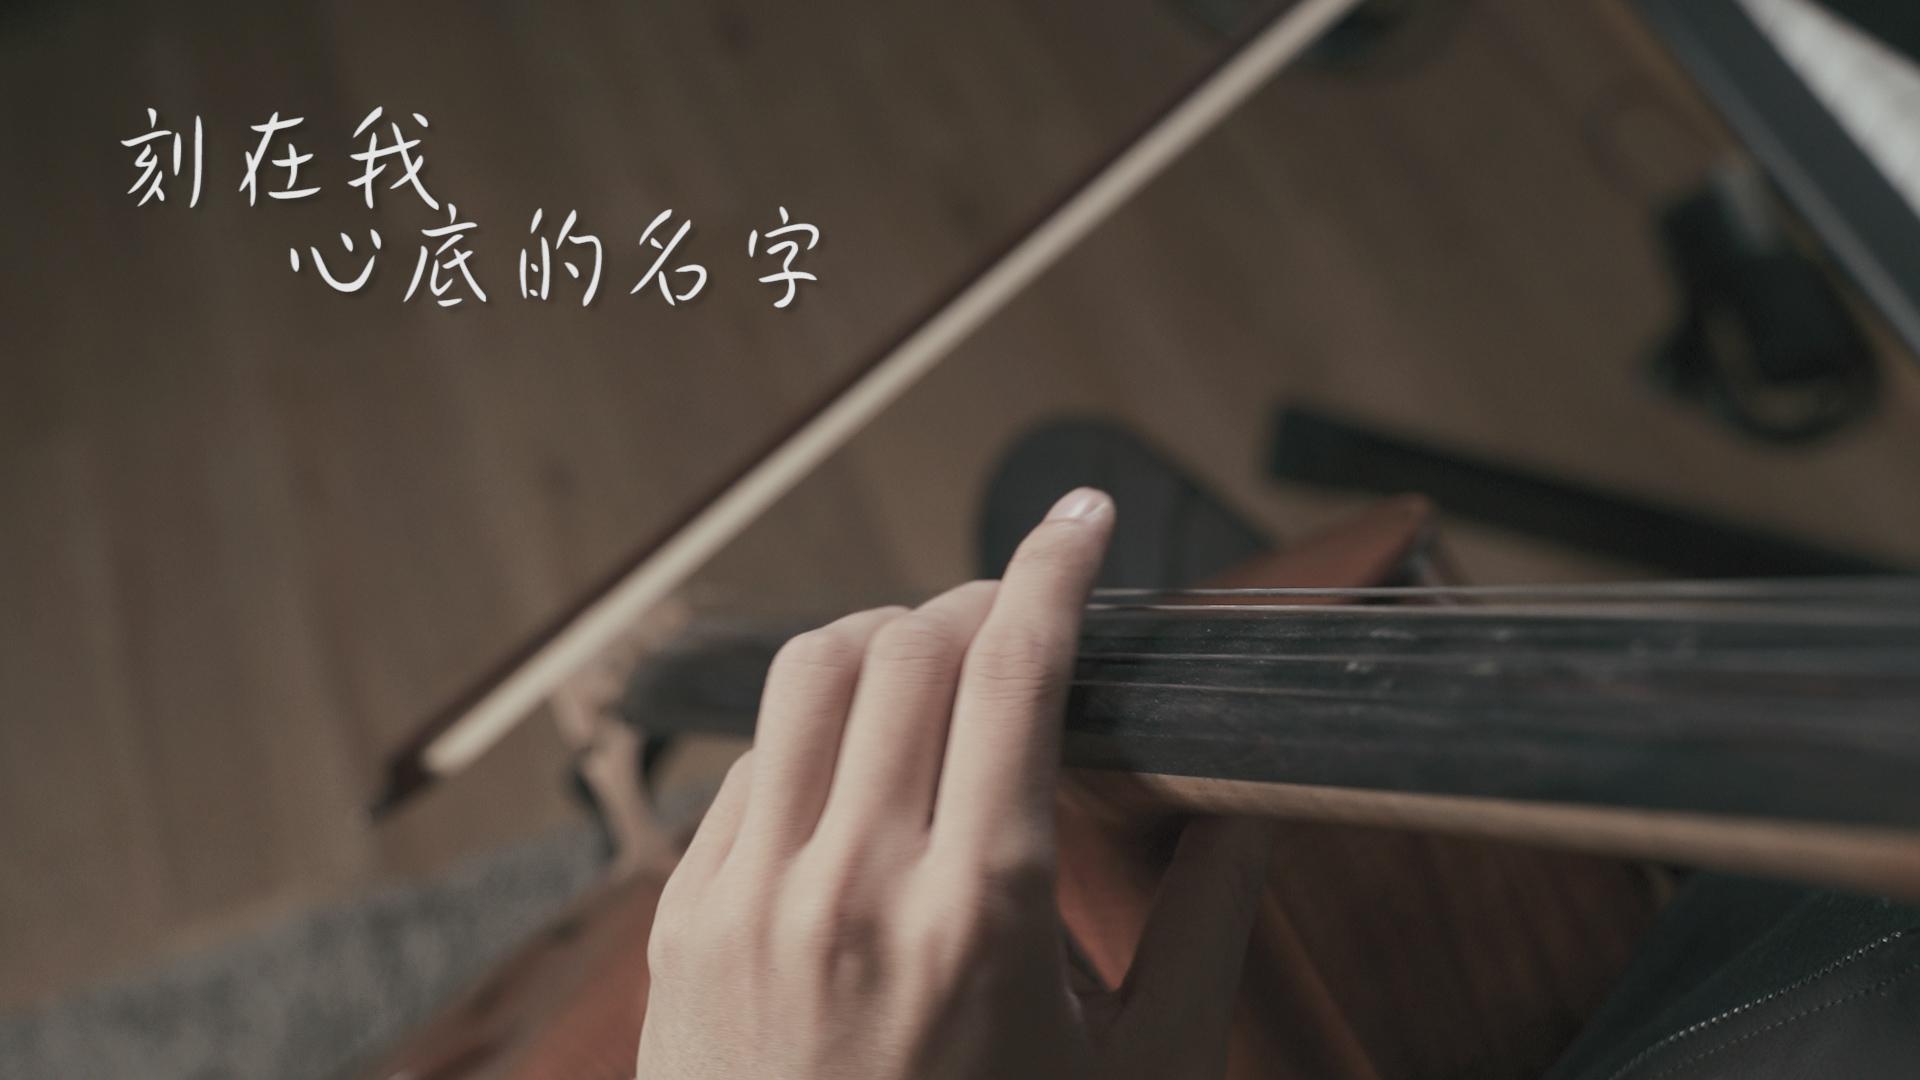 Your Name Engraved Herein, 《刻在我心底的名字》by 盧廣仲,  大提琴演奏 『cover by YoYo Cello』